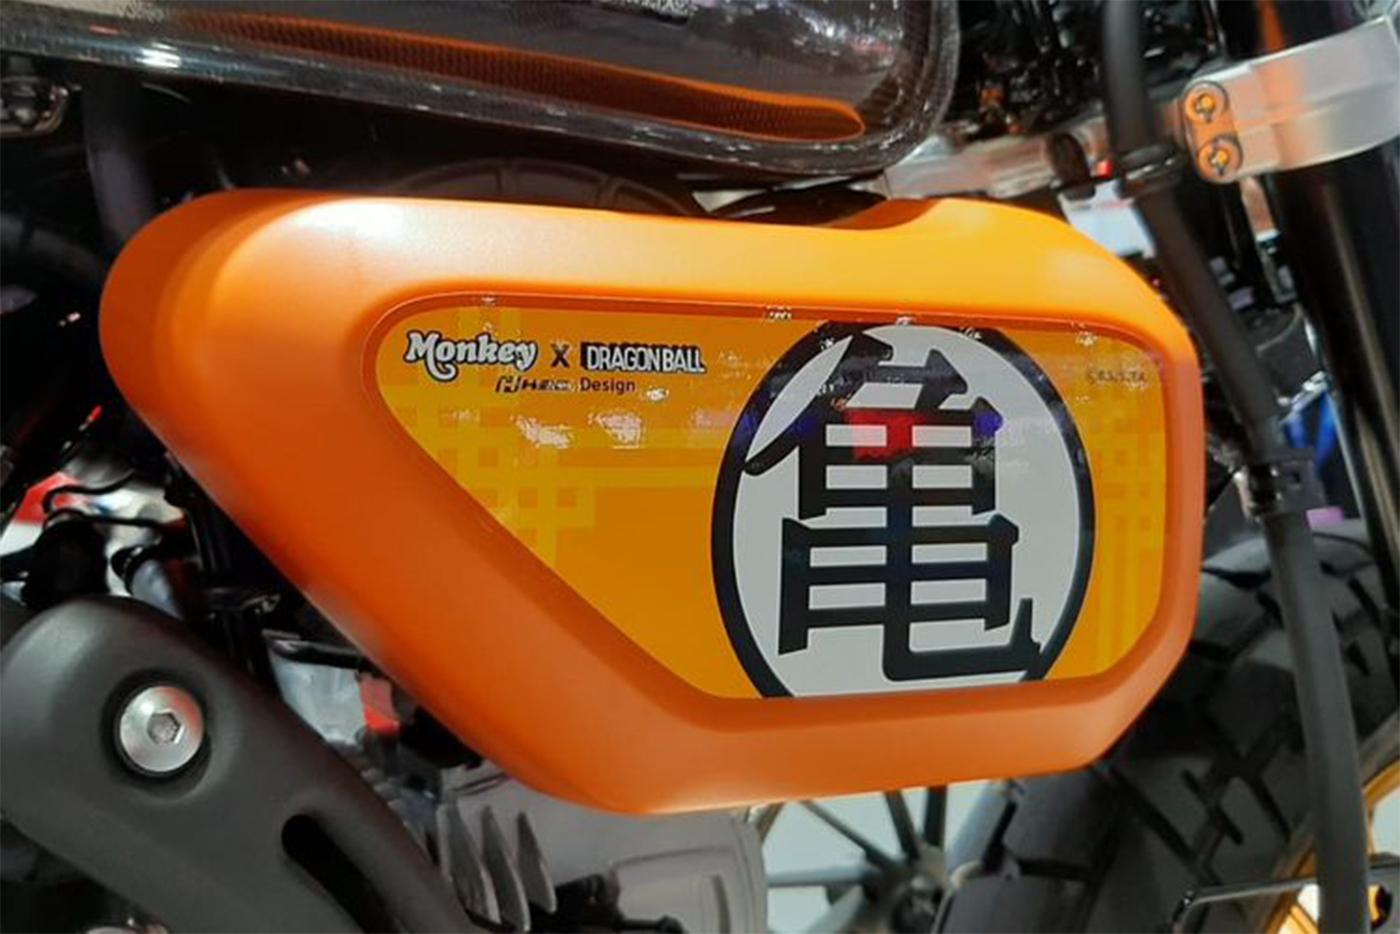 honda-monkey-dragon-ball-2.jpg